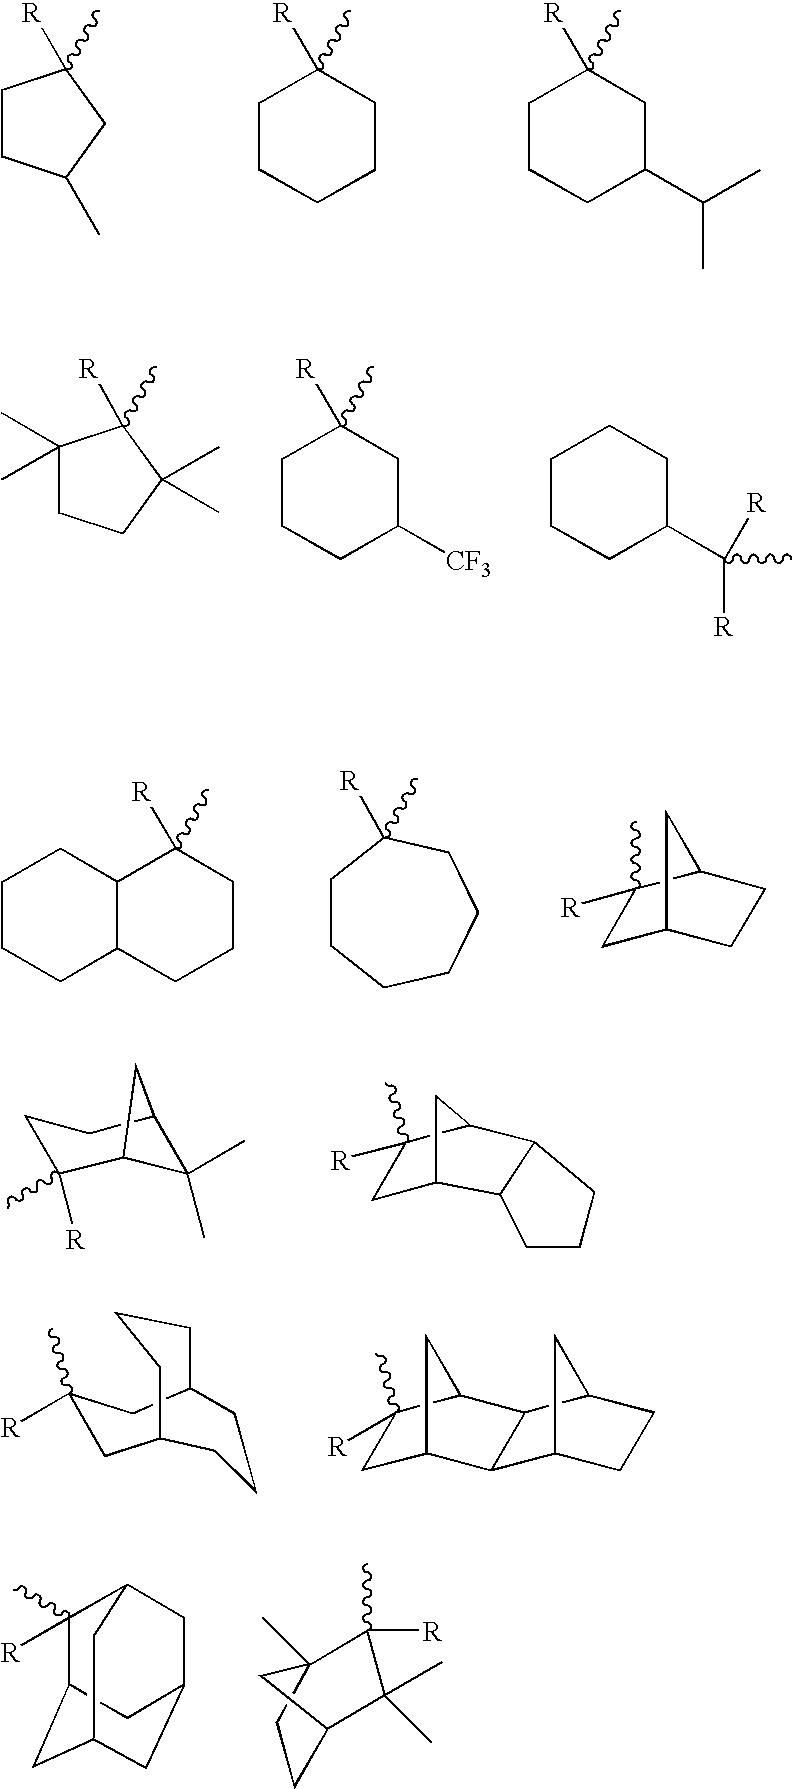 Us7309750b2 Cyanoadamantyl Compounds And Polymers